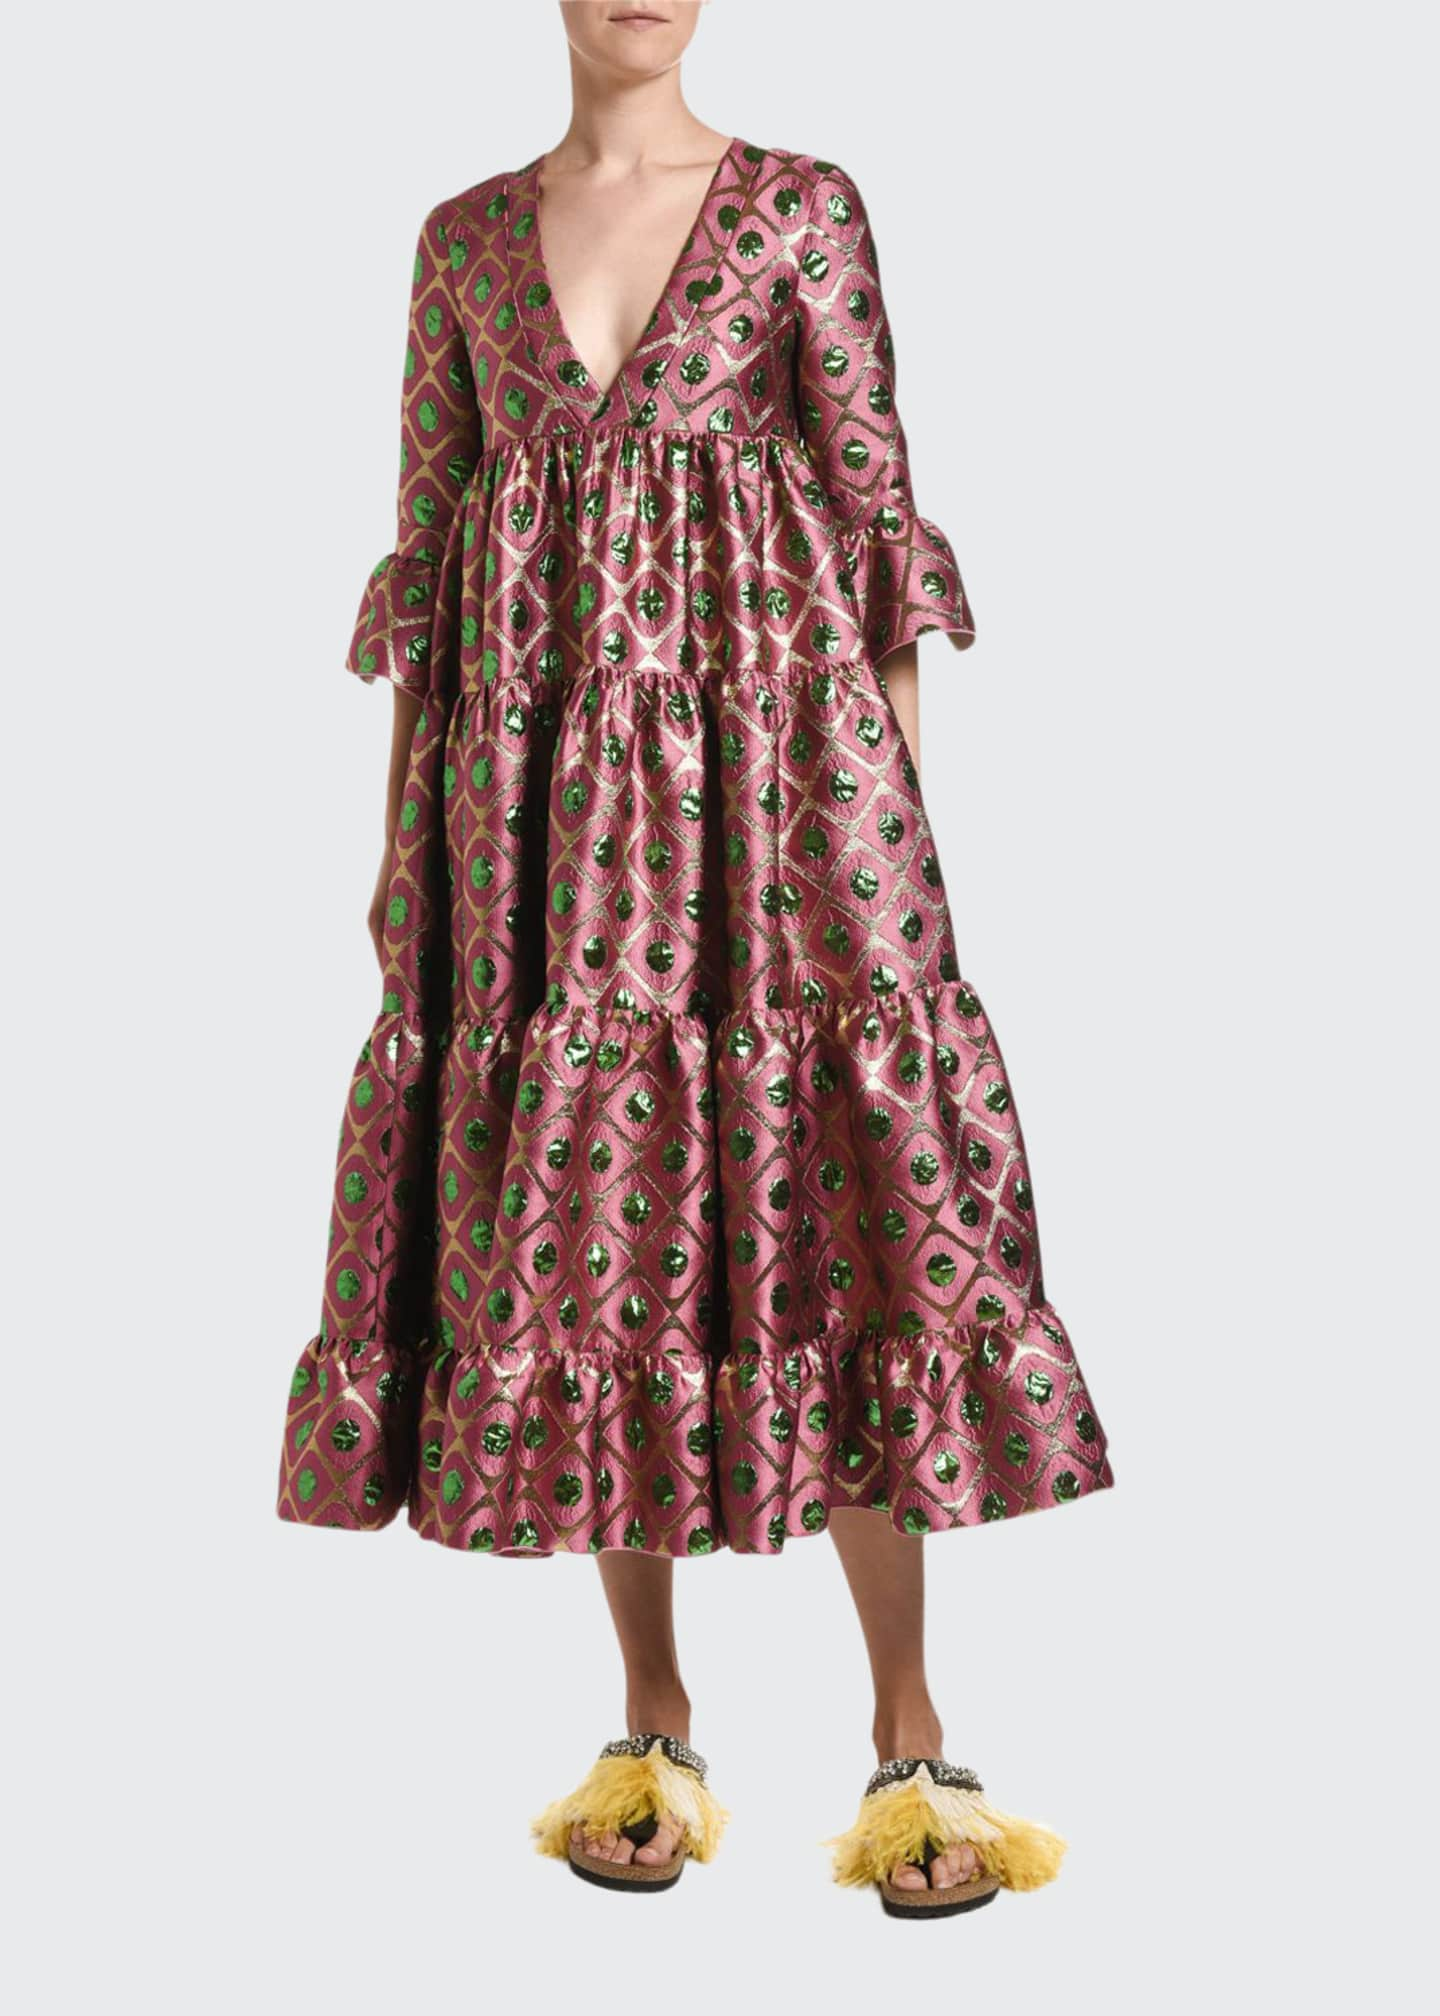 Double J Jennifer Jane Brocade Dress